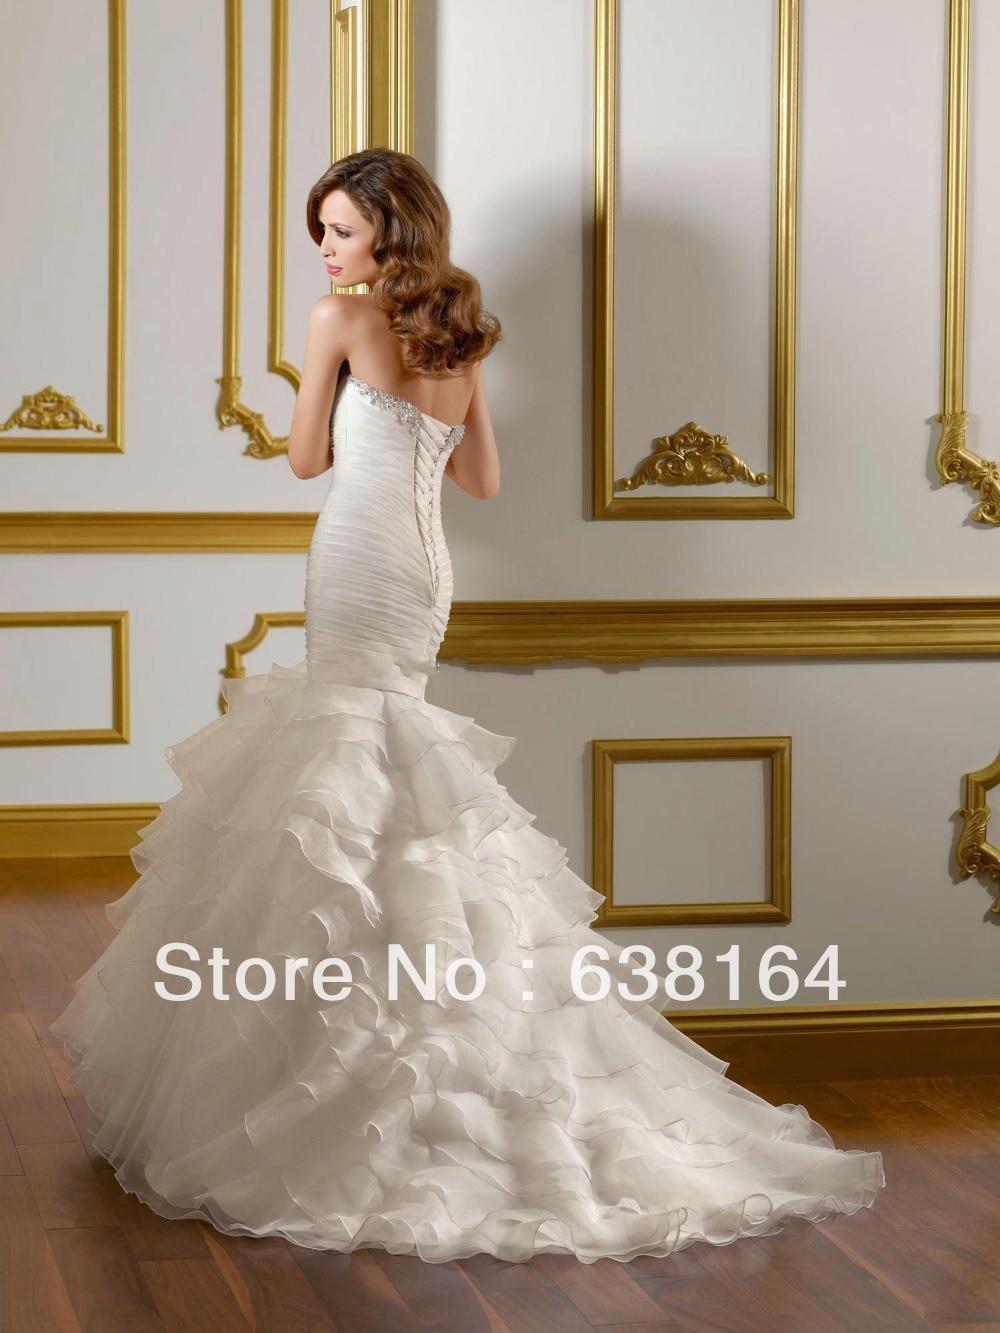 rentable designer dresses for summer weddings wedding dresses for rent brideblacktie2 brideblacktie